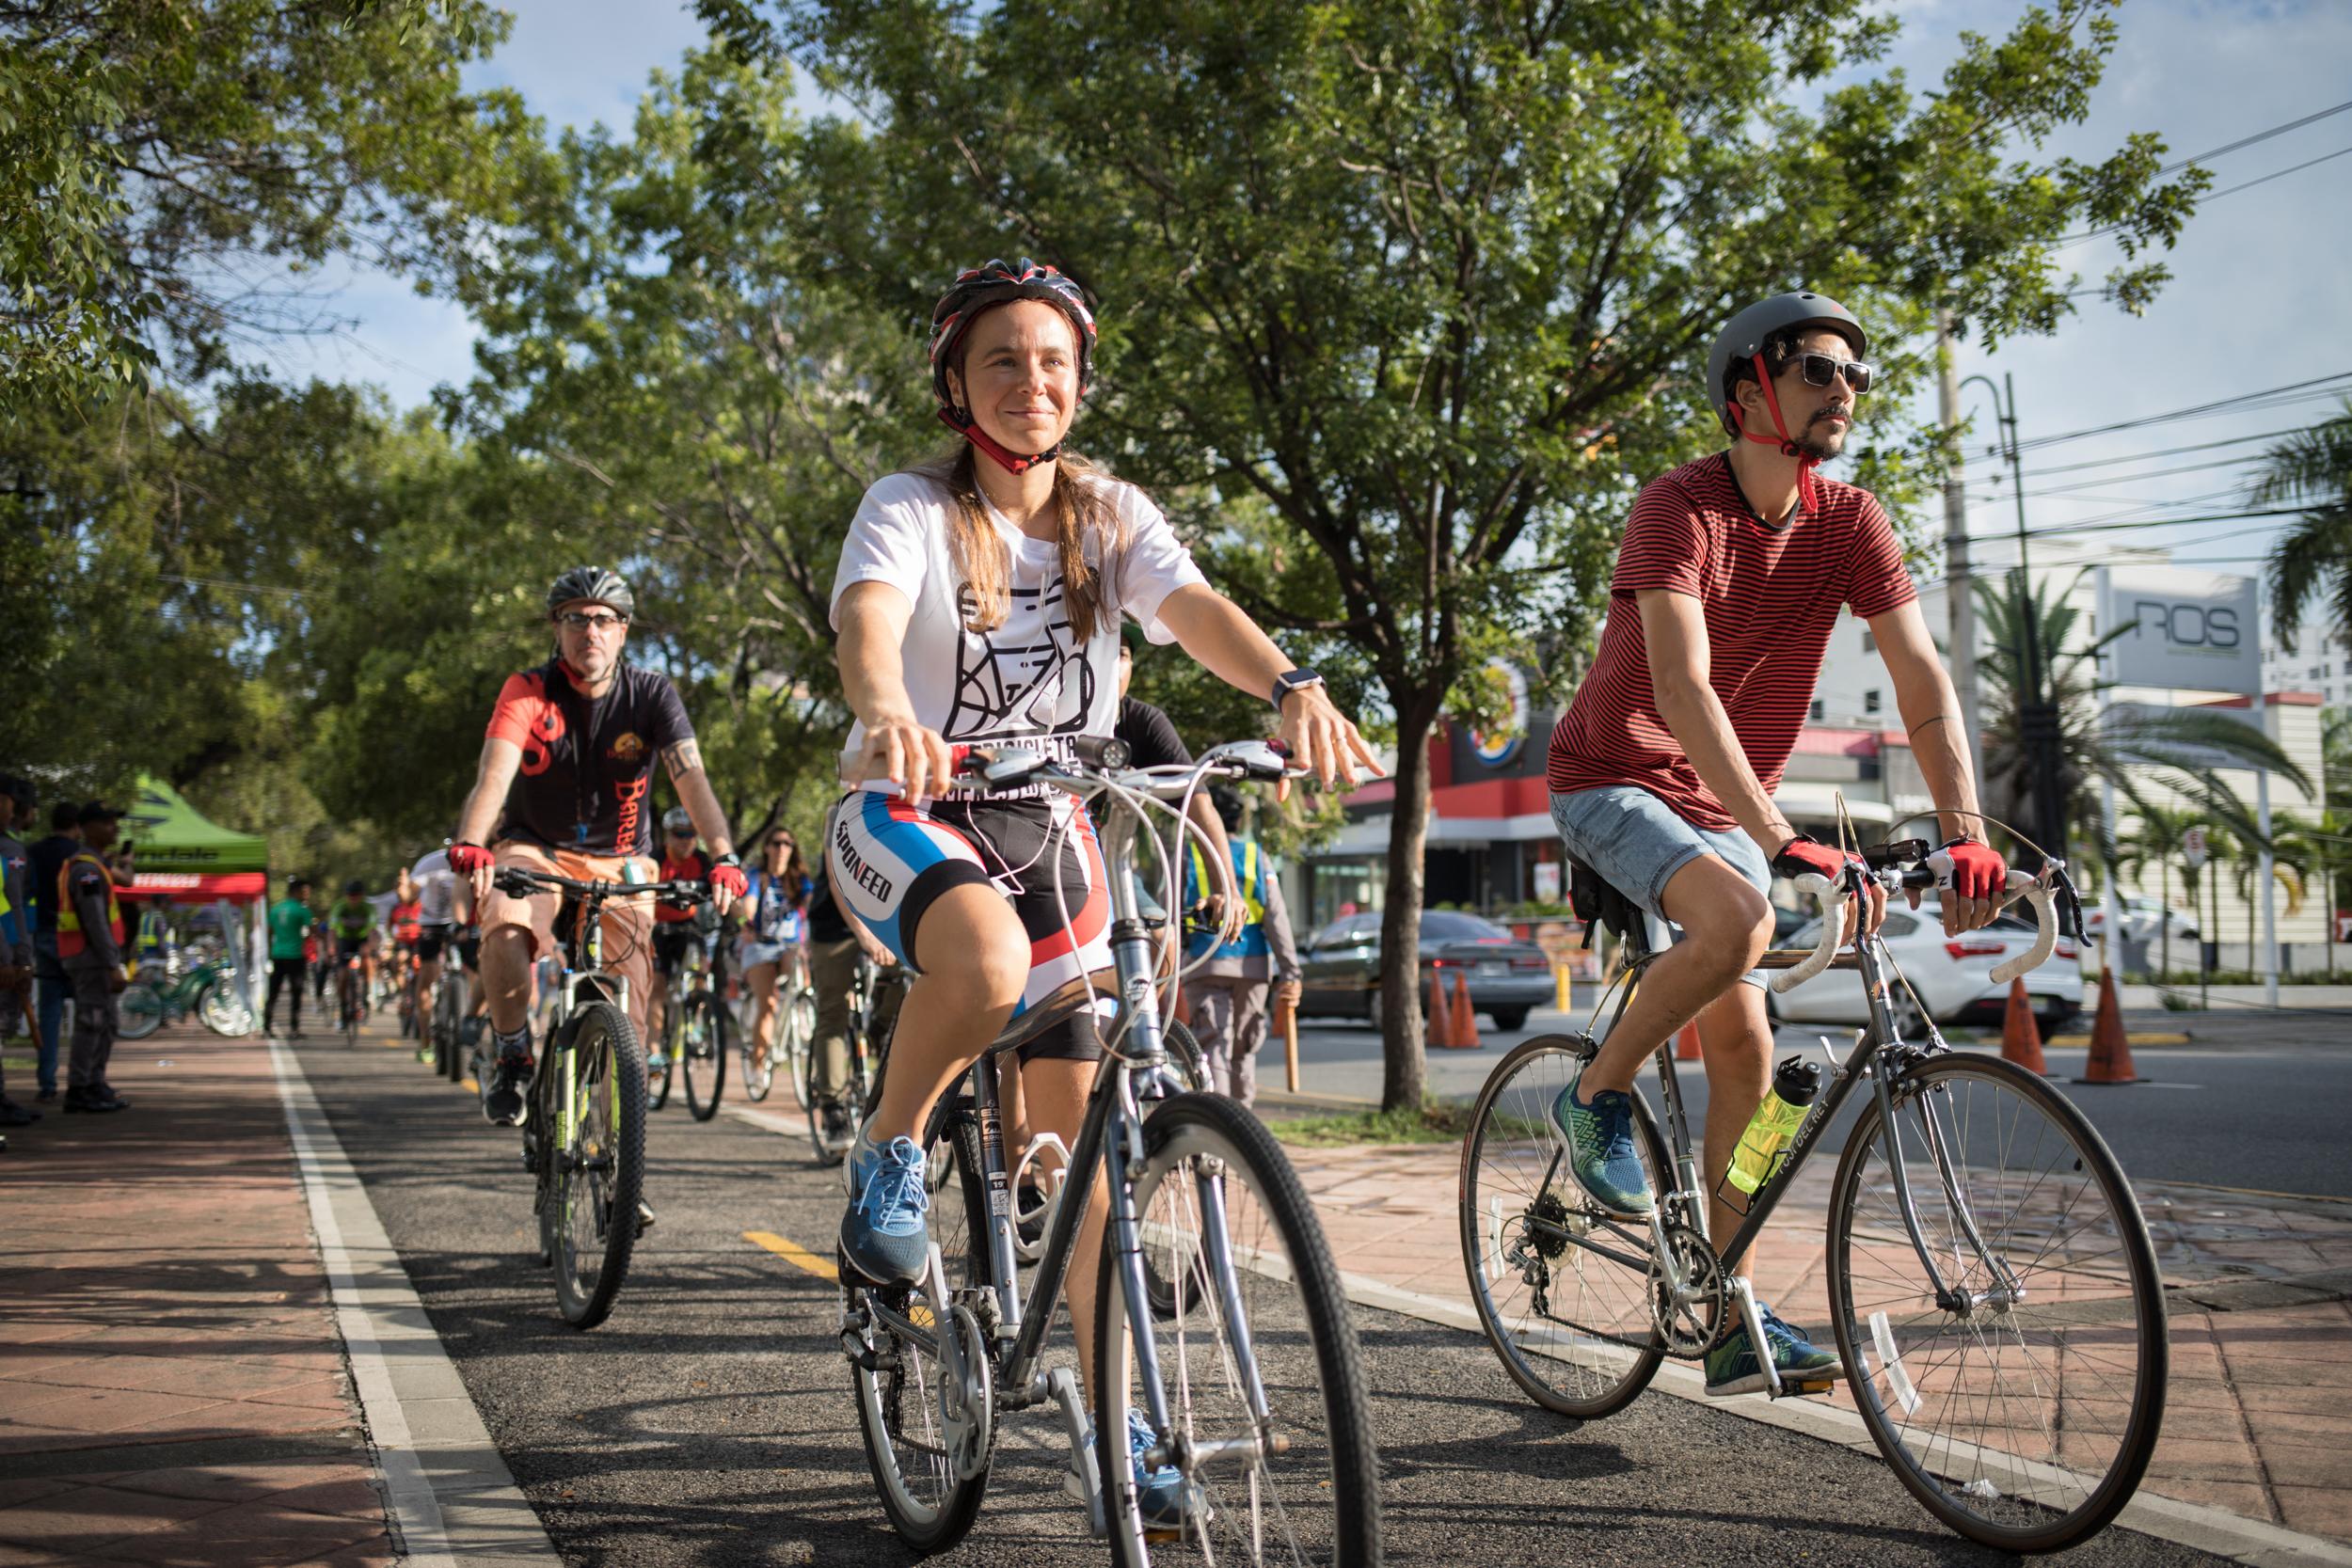 Ciclistas proponen uso de bicicletas como transporte para prevenir COVID-19